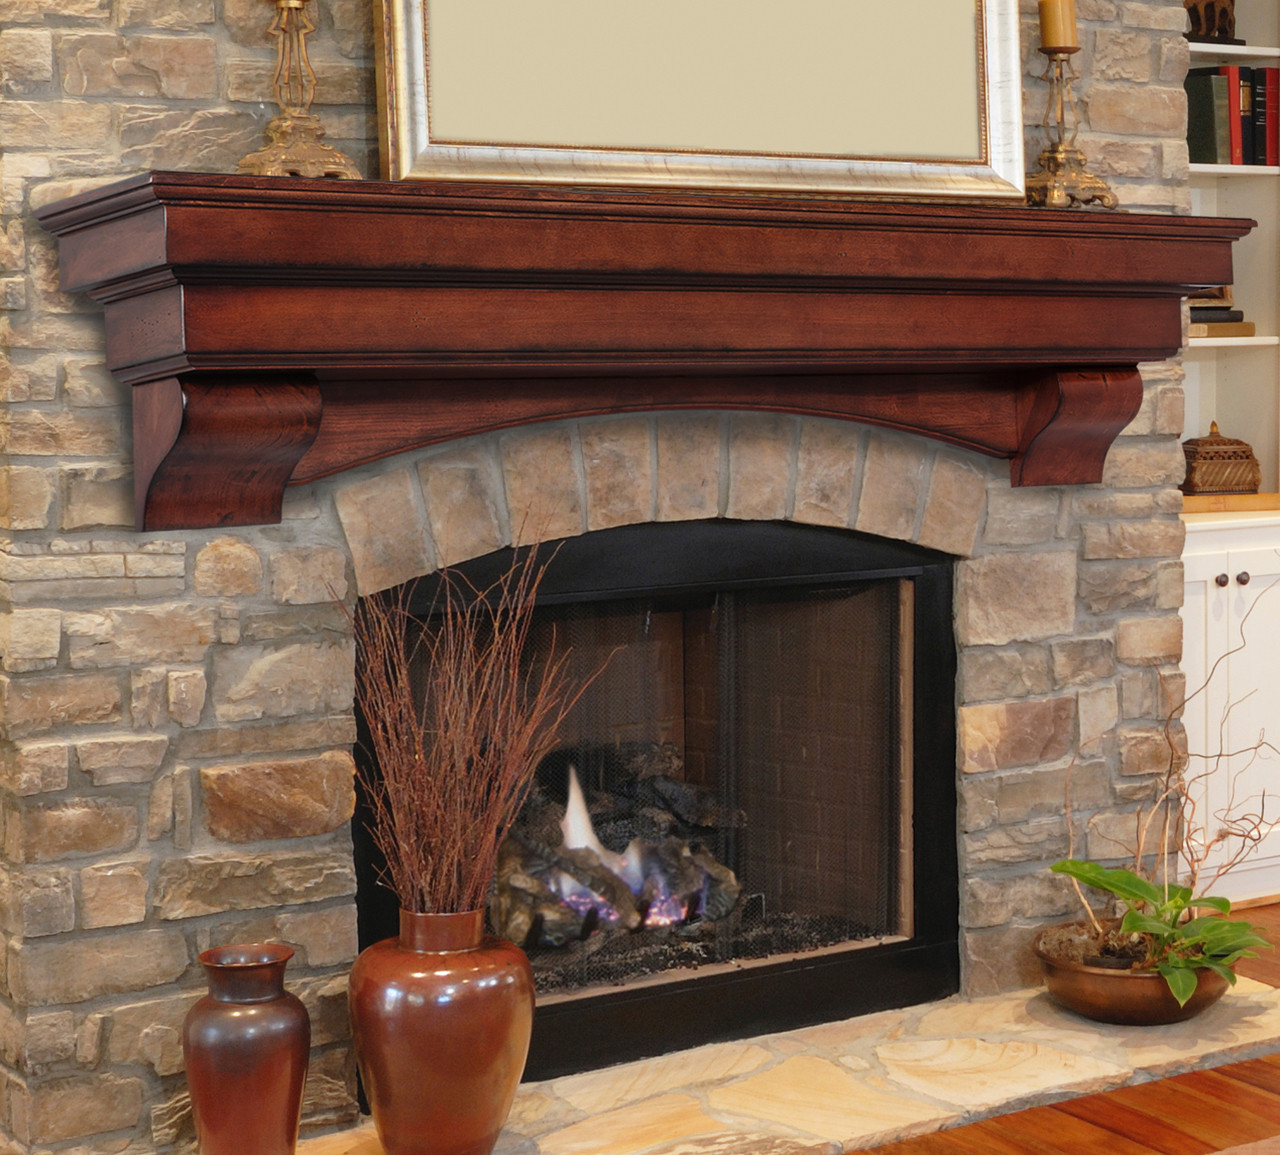 The Auburn 495 Fireplace Mantel Shelf, Life Style View 2